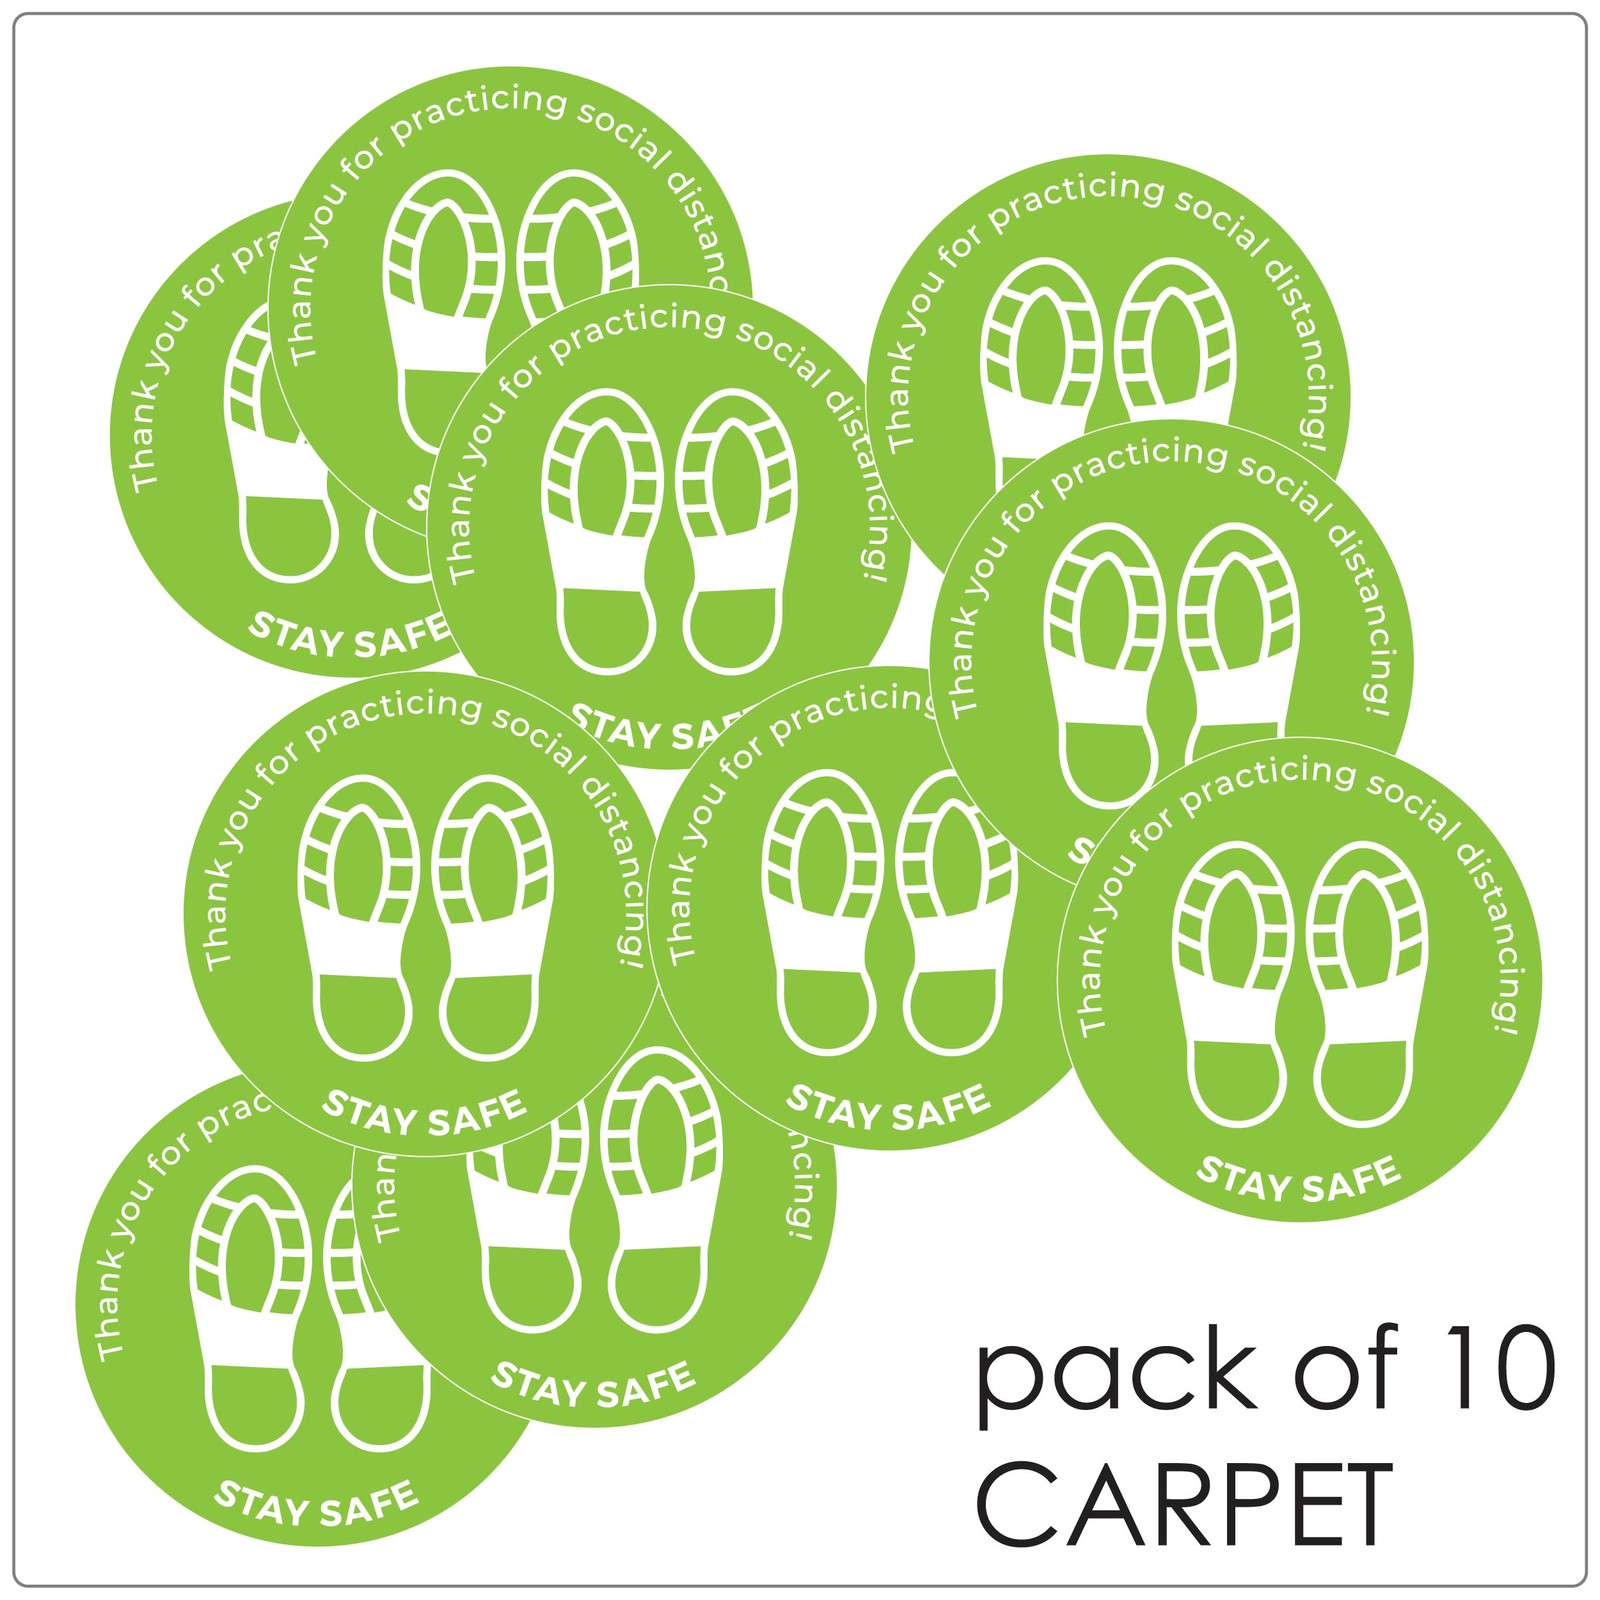 social distancing floor sticker for carpet, pack of 10 Self-adhesive Corona virus floor sticker to help social distancing.